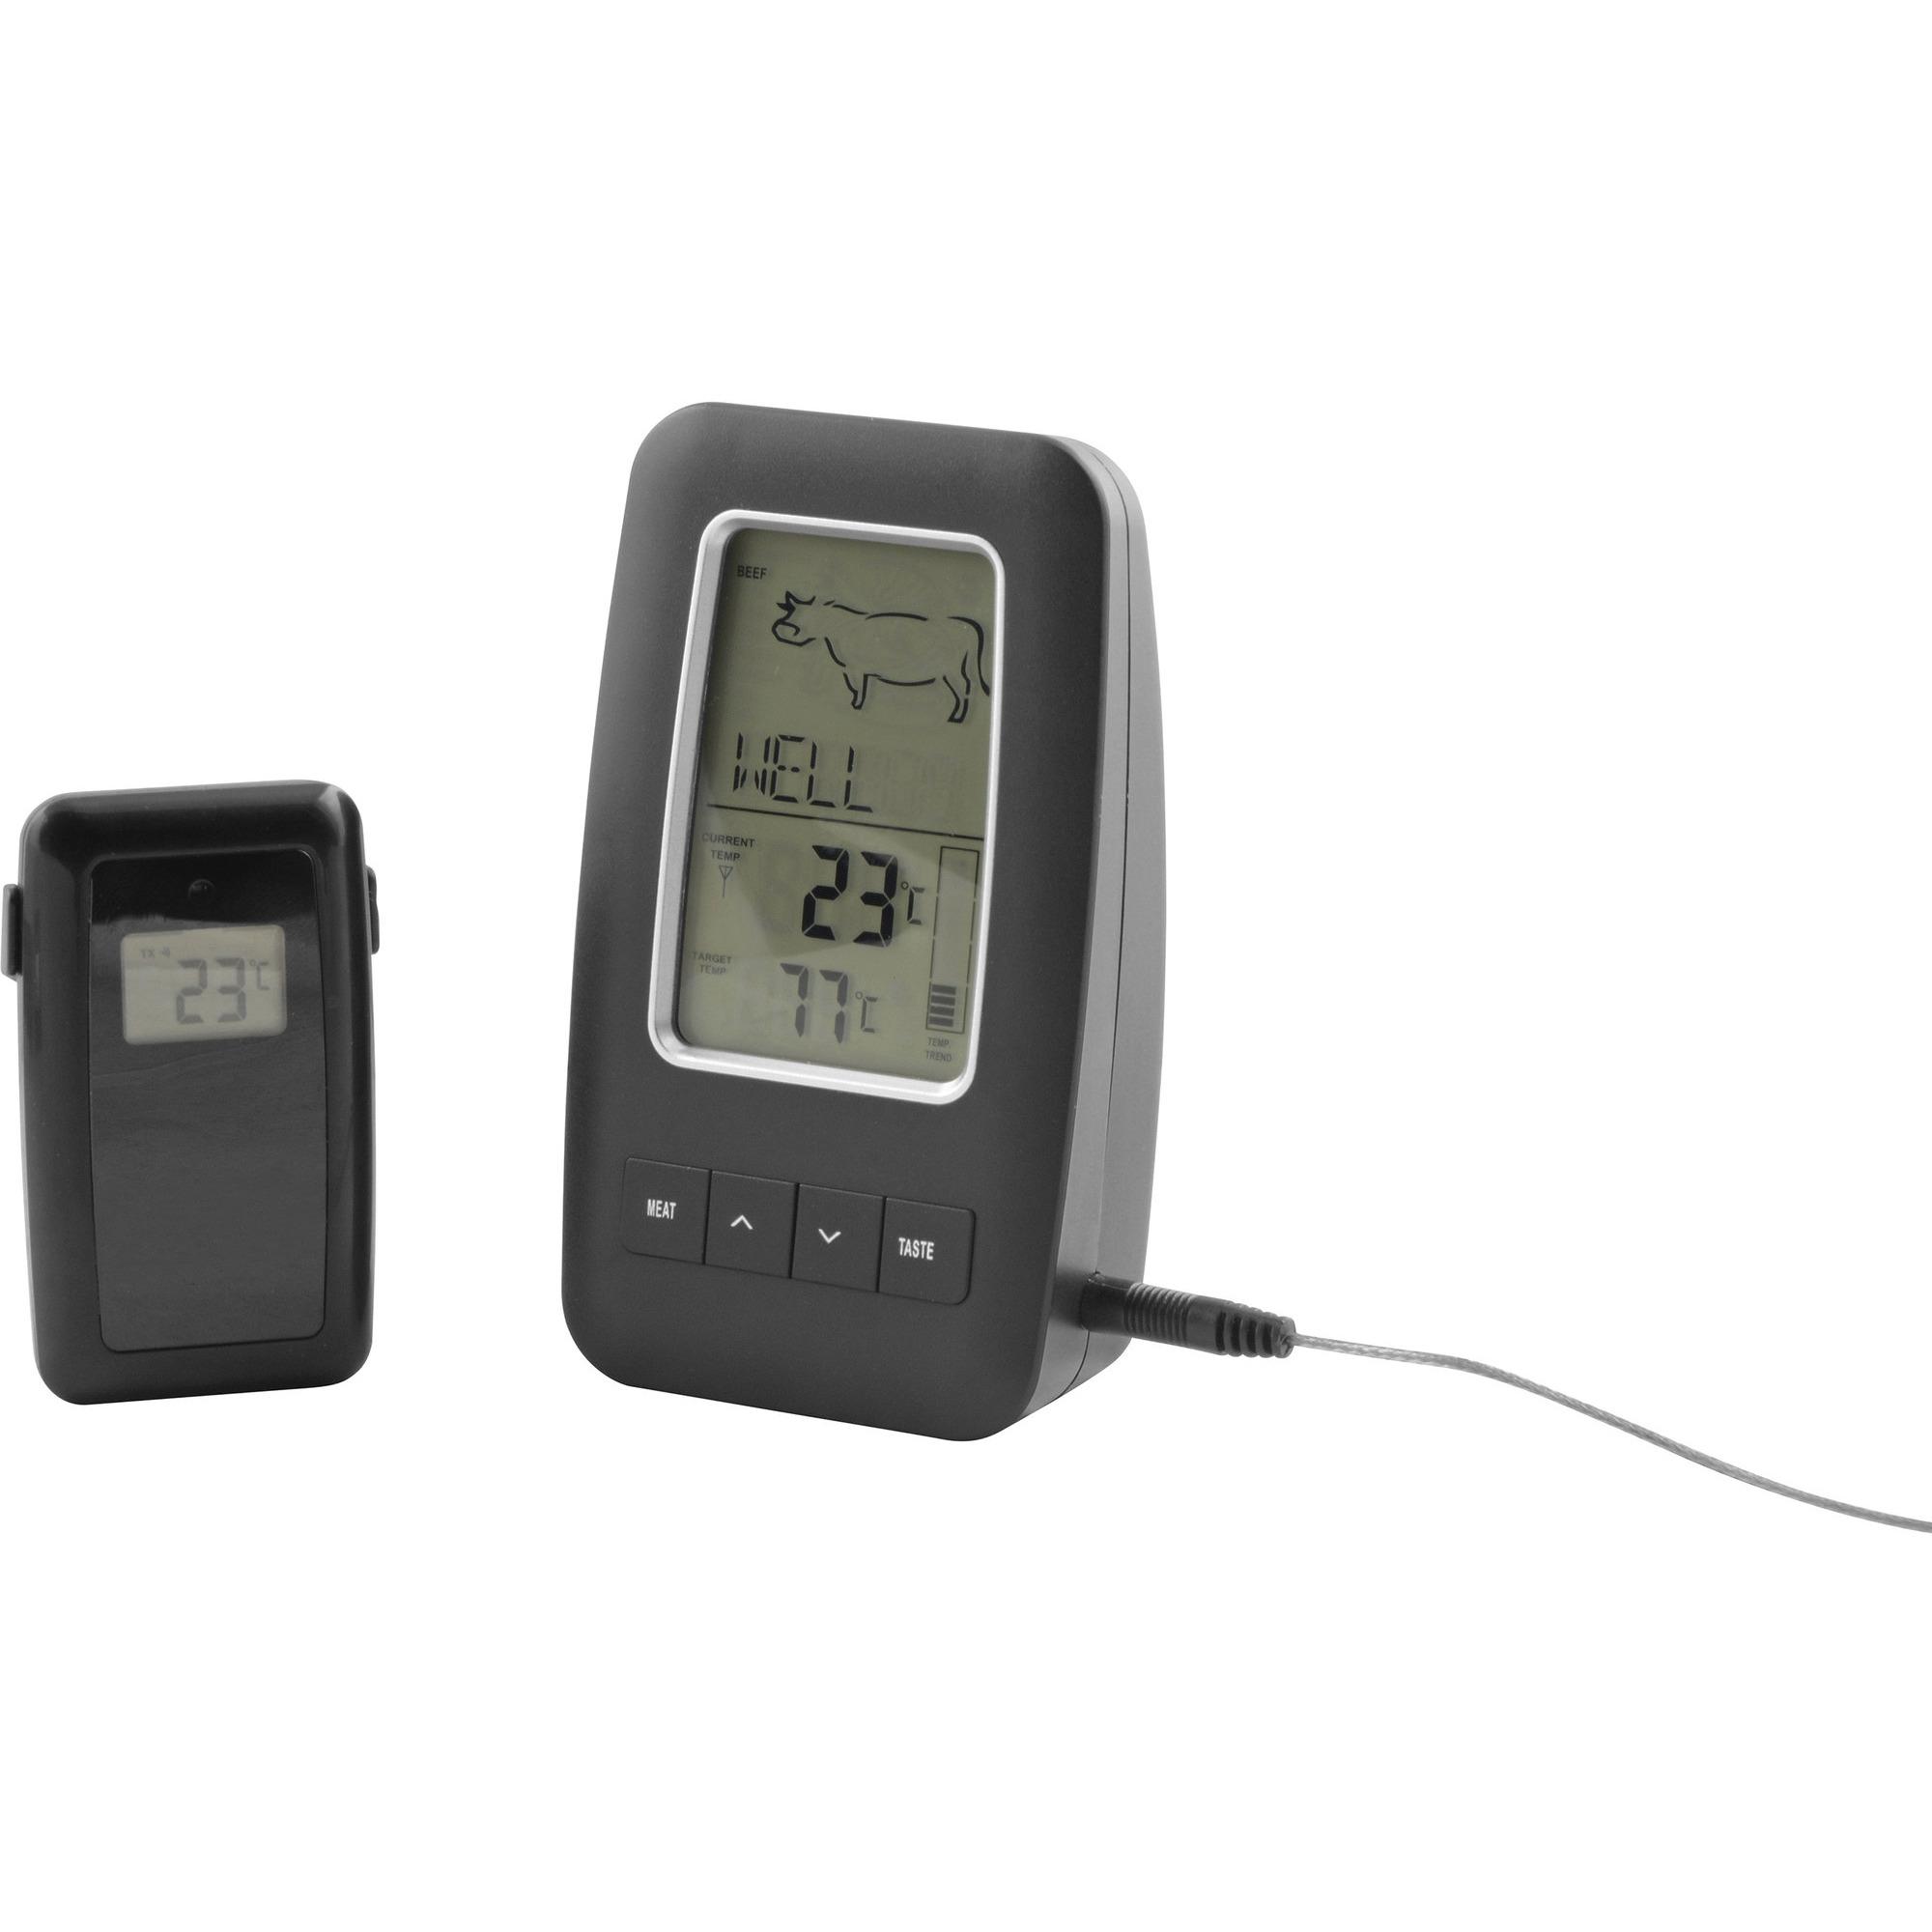 Dangrill Stektermometer trådlös